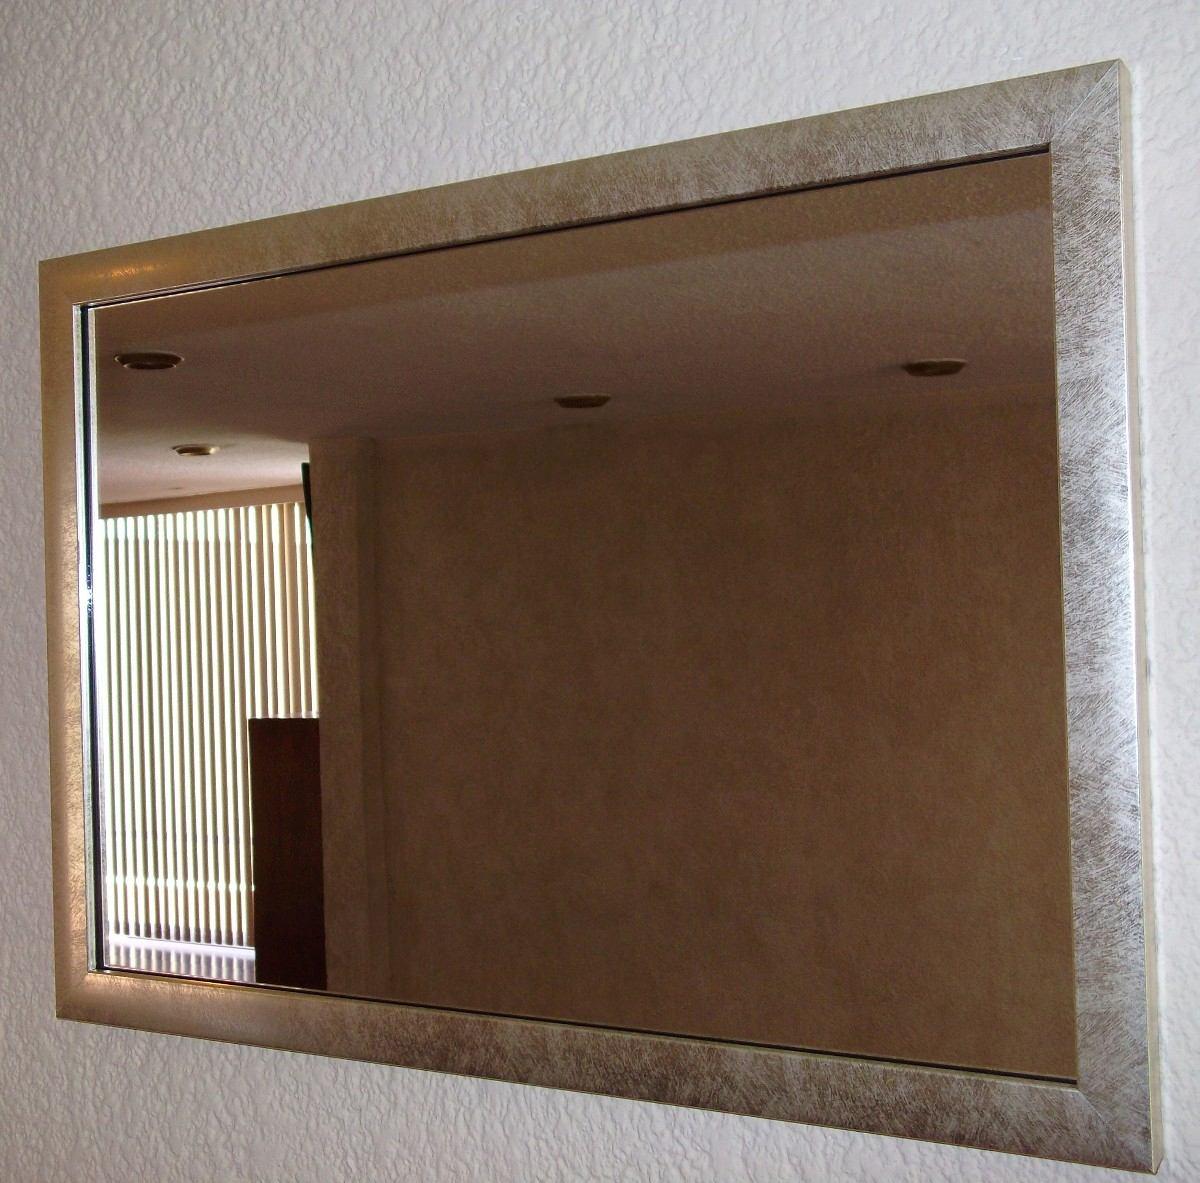 espejo medida 45 x 65 espejo para ba o espejo decorativo